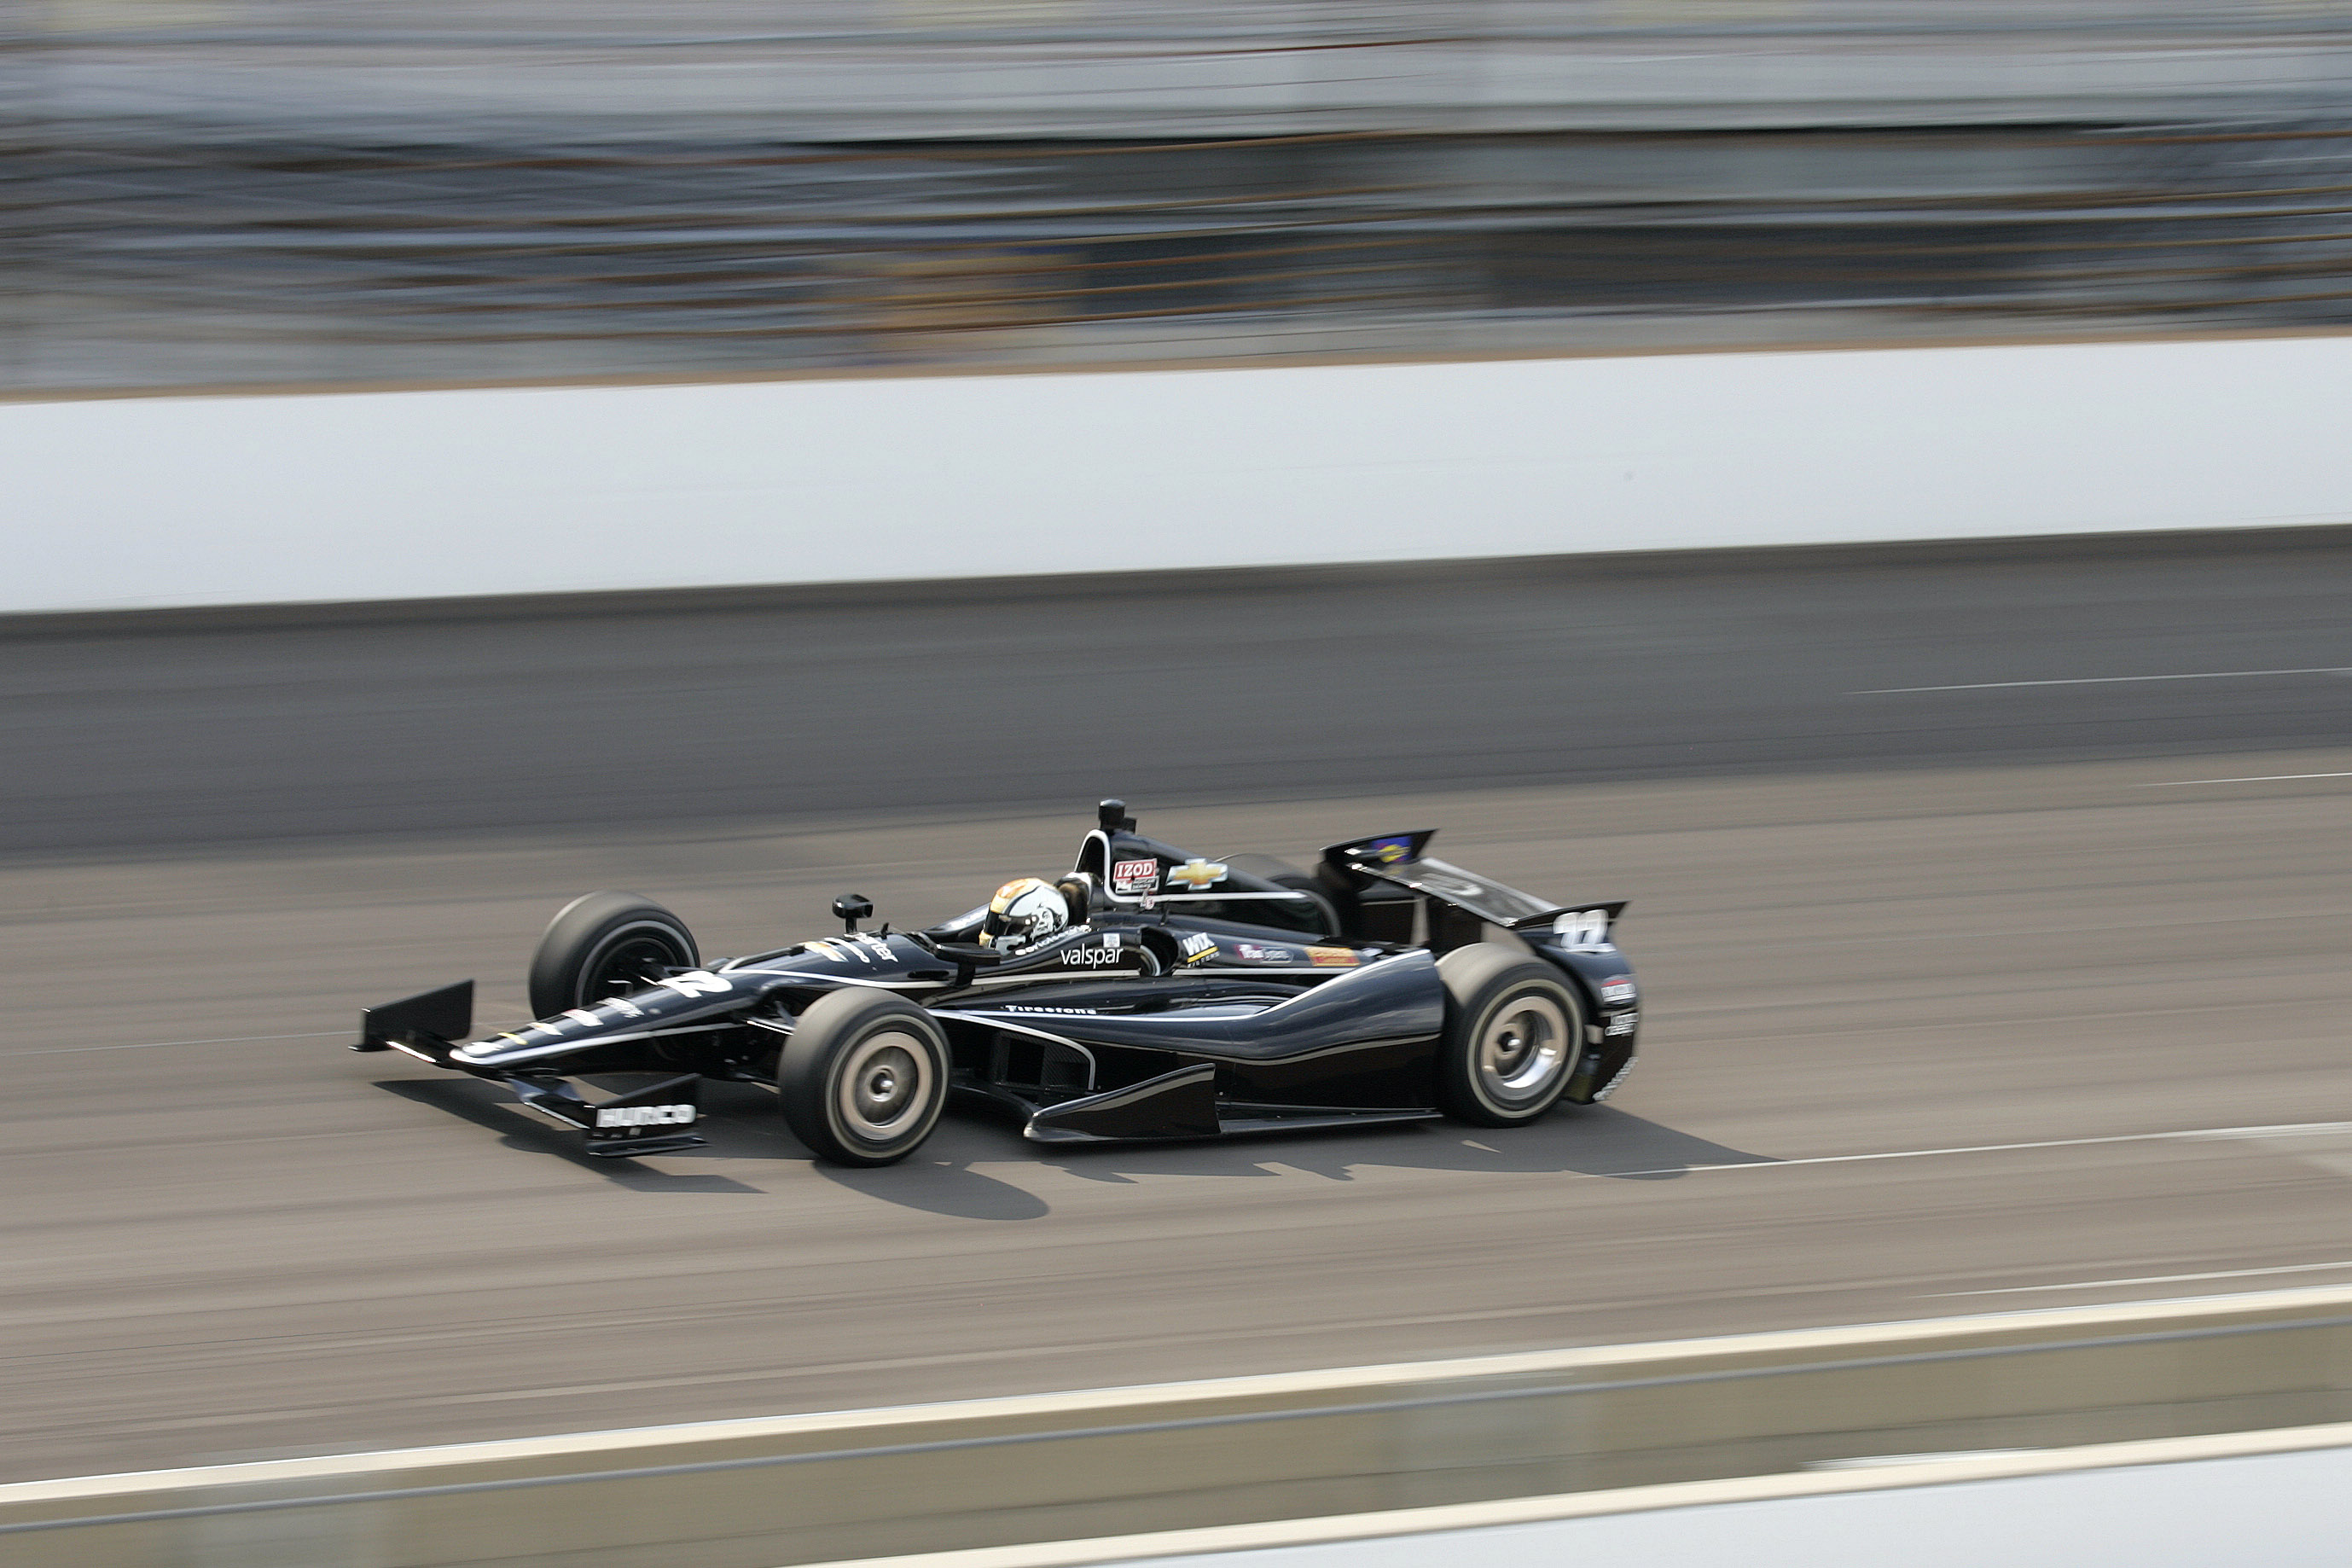 Oriol Servia Indy 500 2012